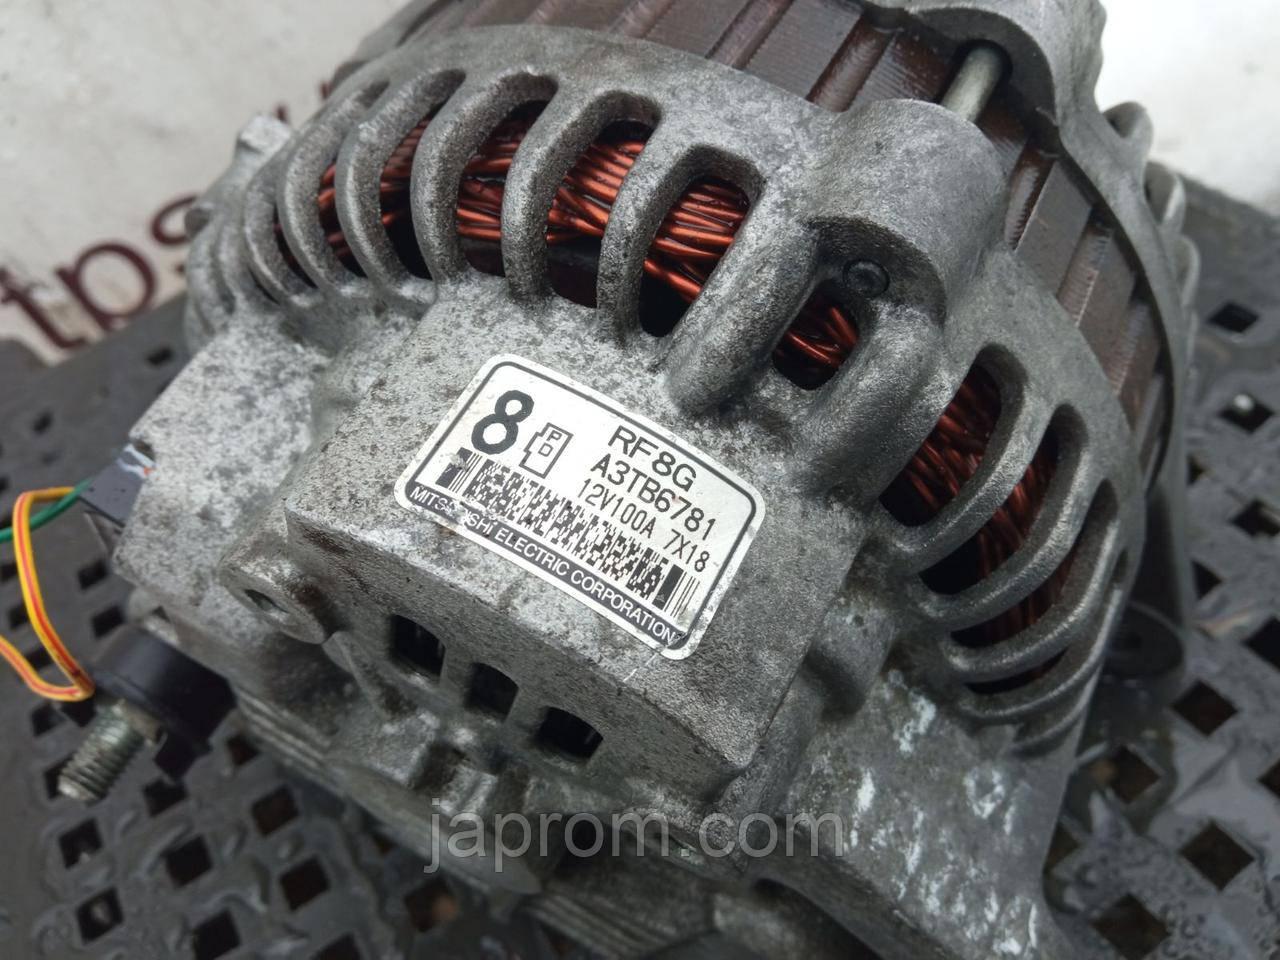 Генератор Mazda 6 GG GH 5 100A 05-12г.в. RF8G 2,0 дизель RF7G